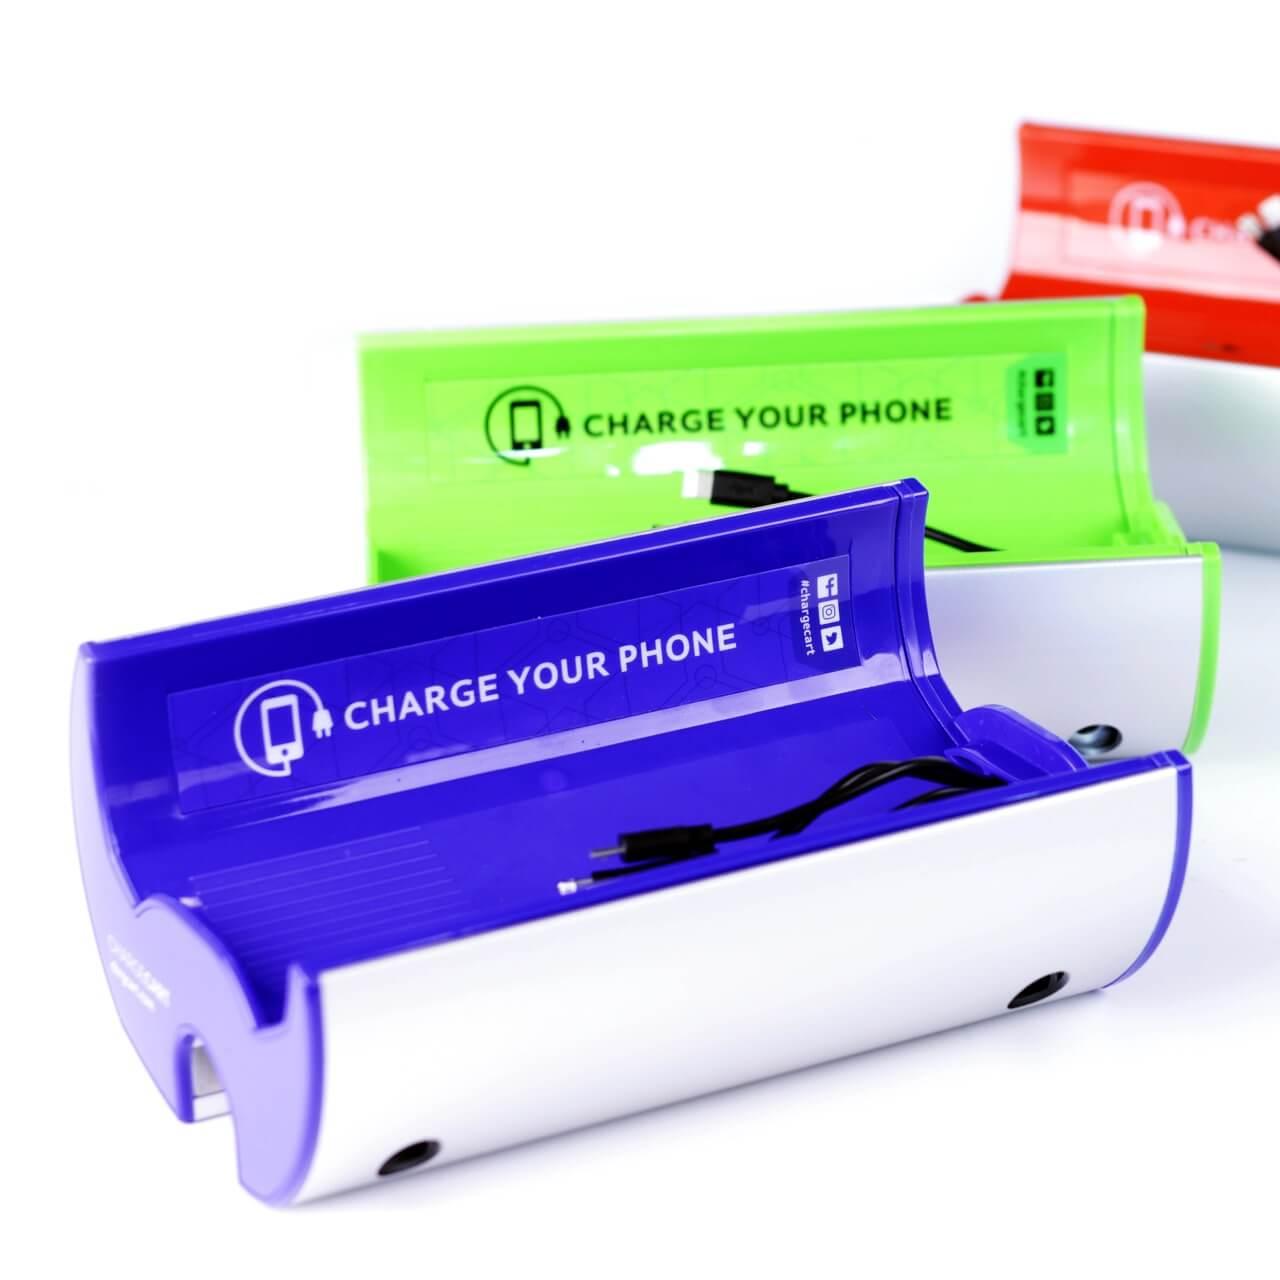 Yucharge Cargador para móviles ChargeTrolley para carritos compra